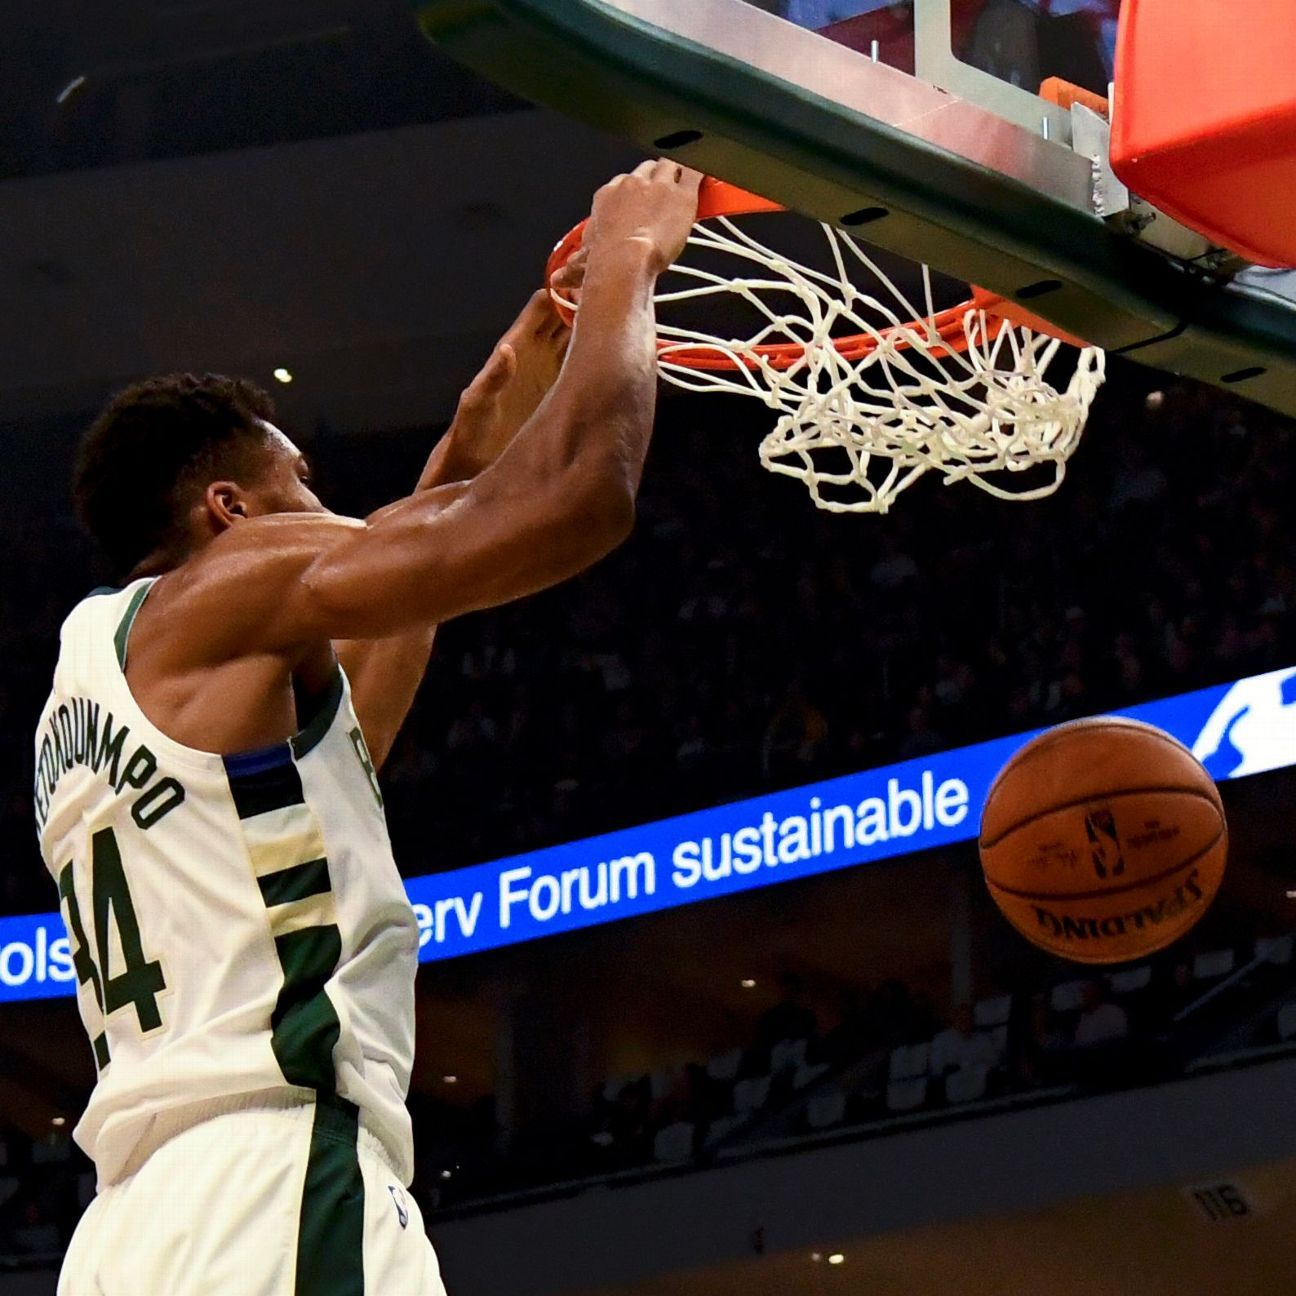 NBA -- Bucks Announce Their Presence In Dominance Of Warriors